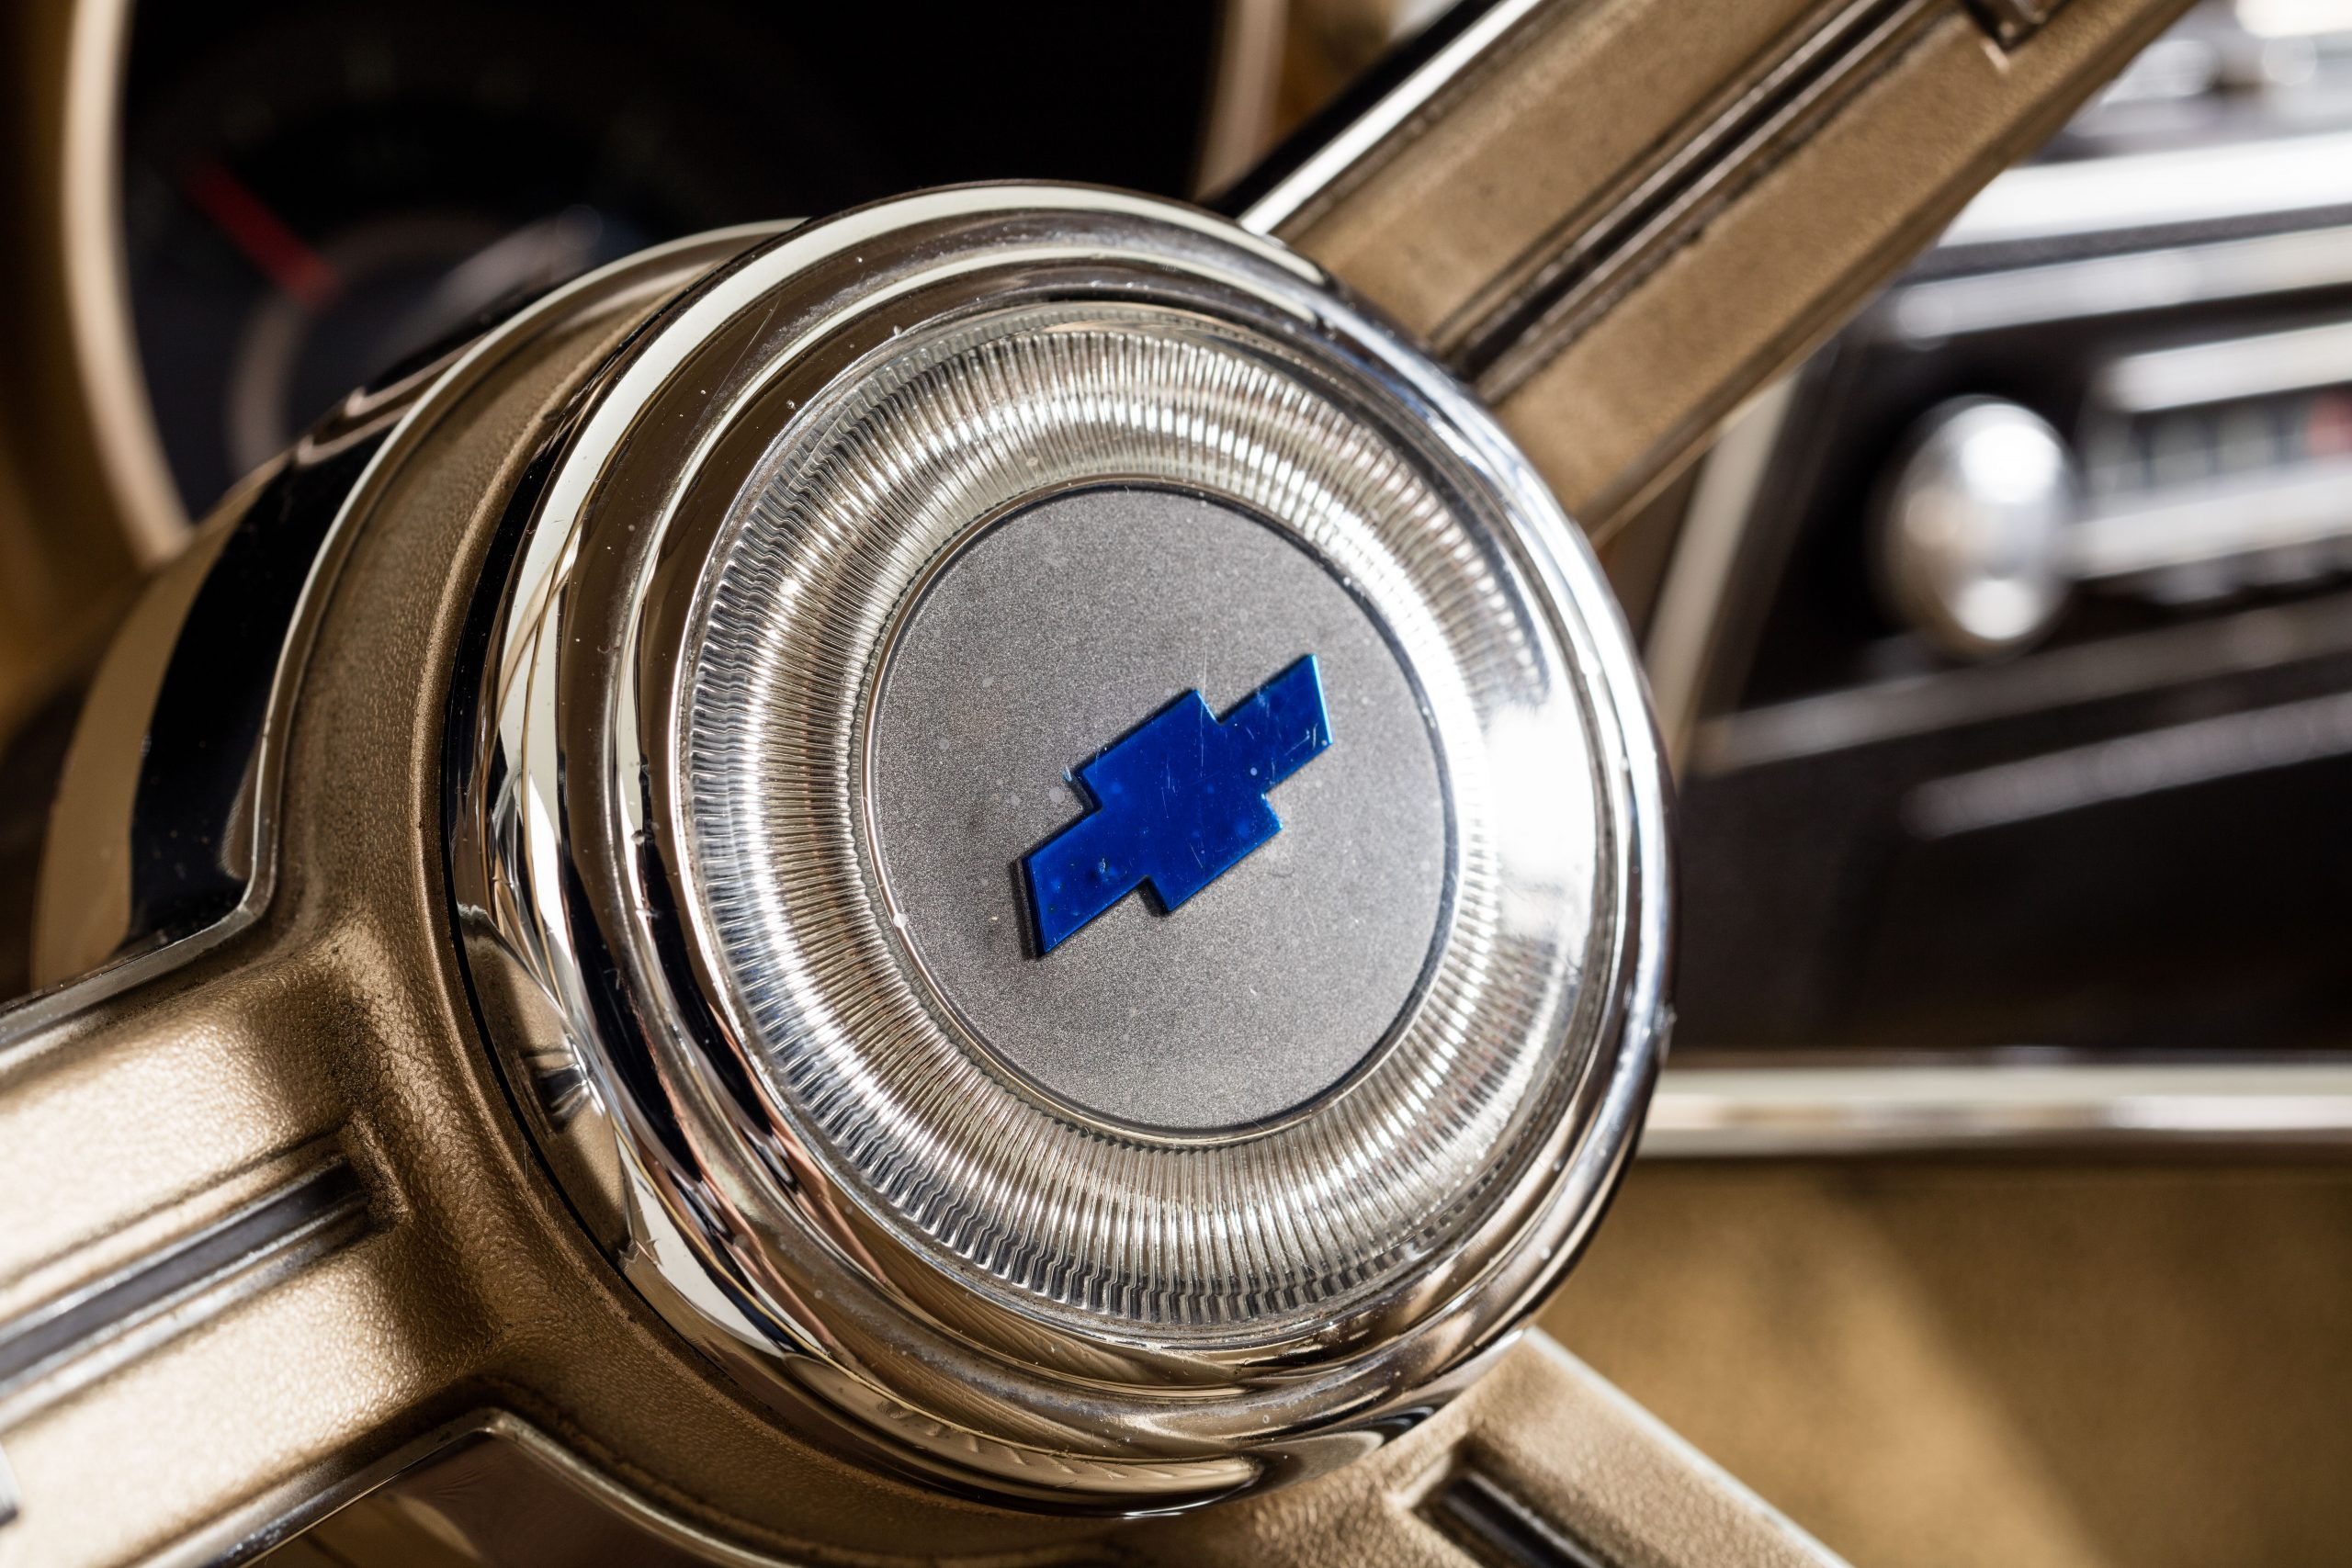 HVA - Chevrolet Camaro N100001 - Closeup steering wheel hub